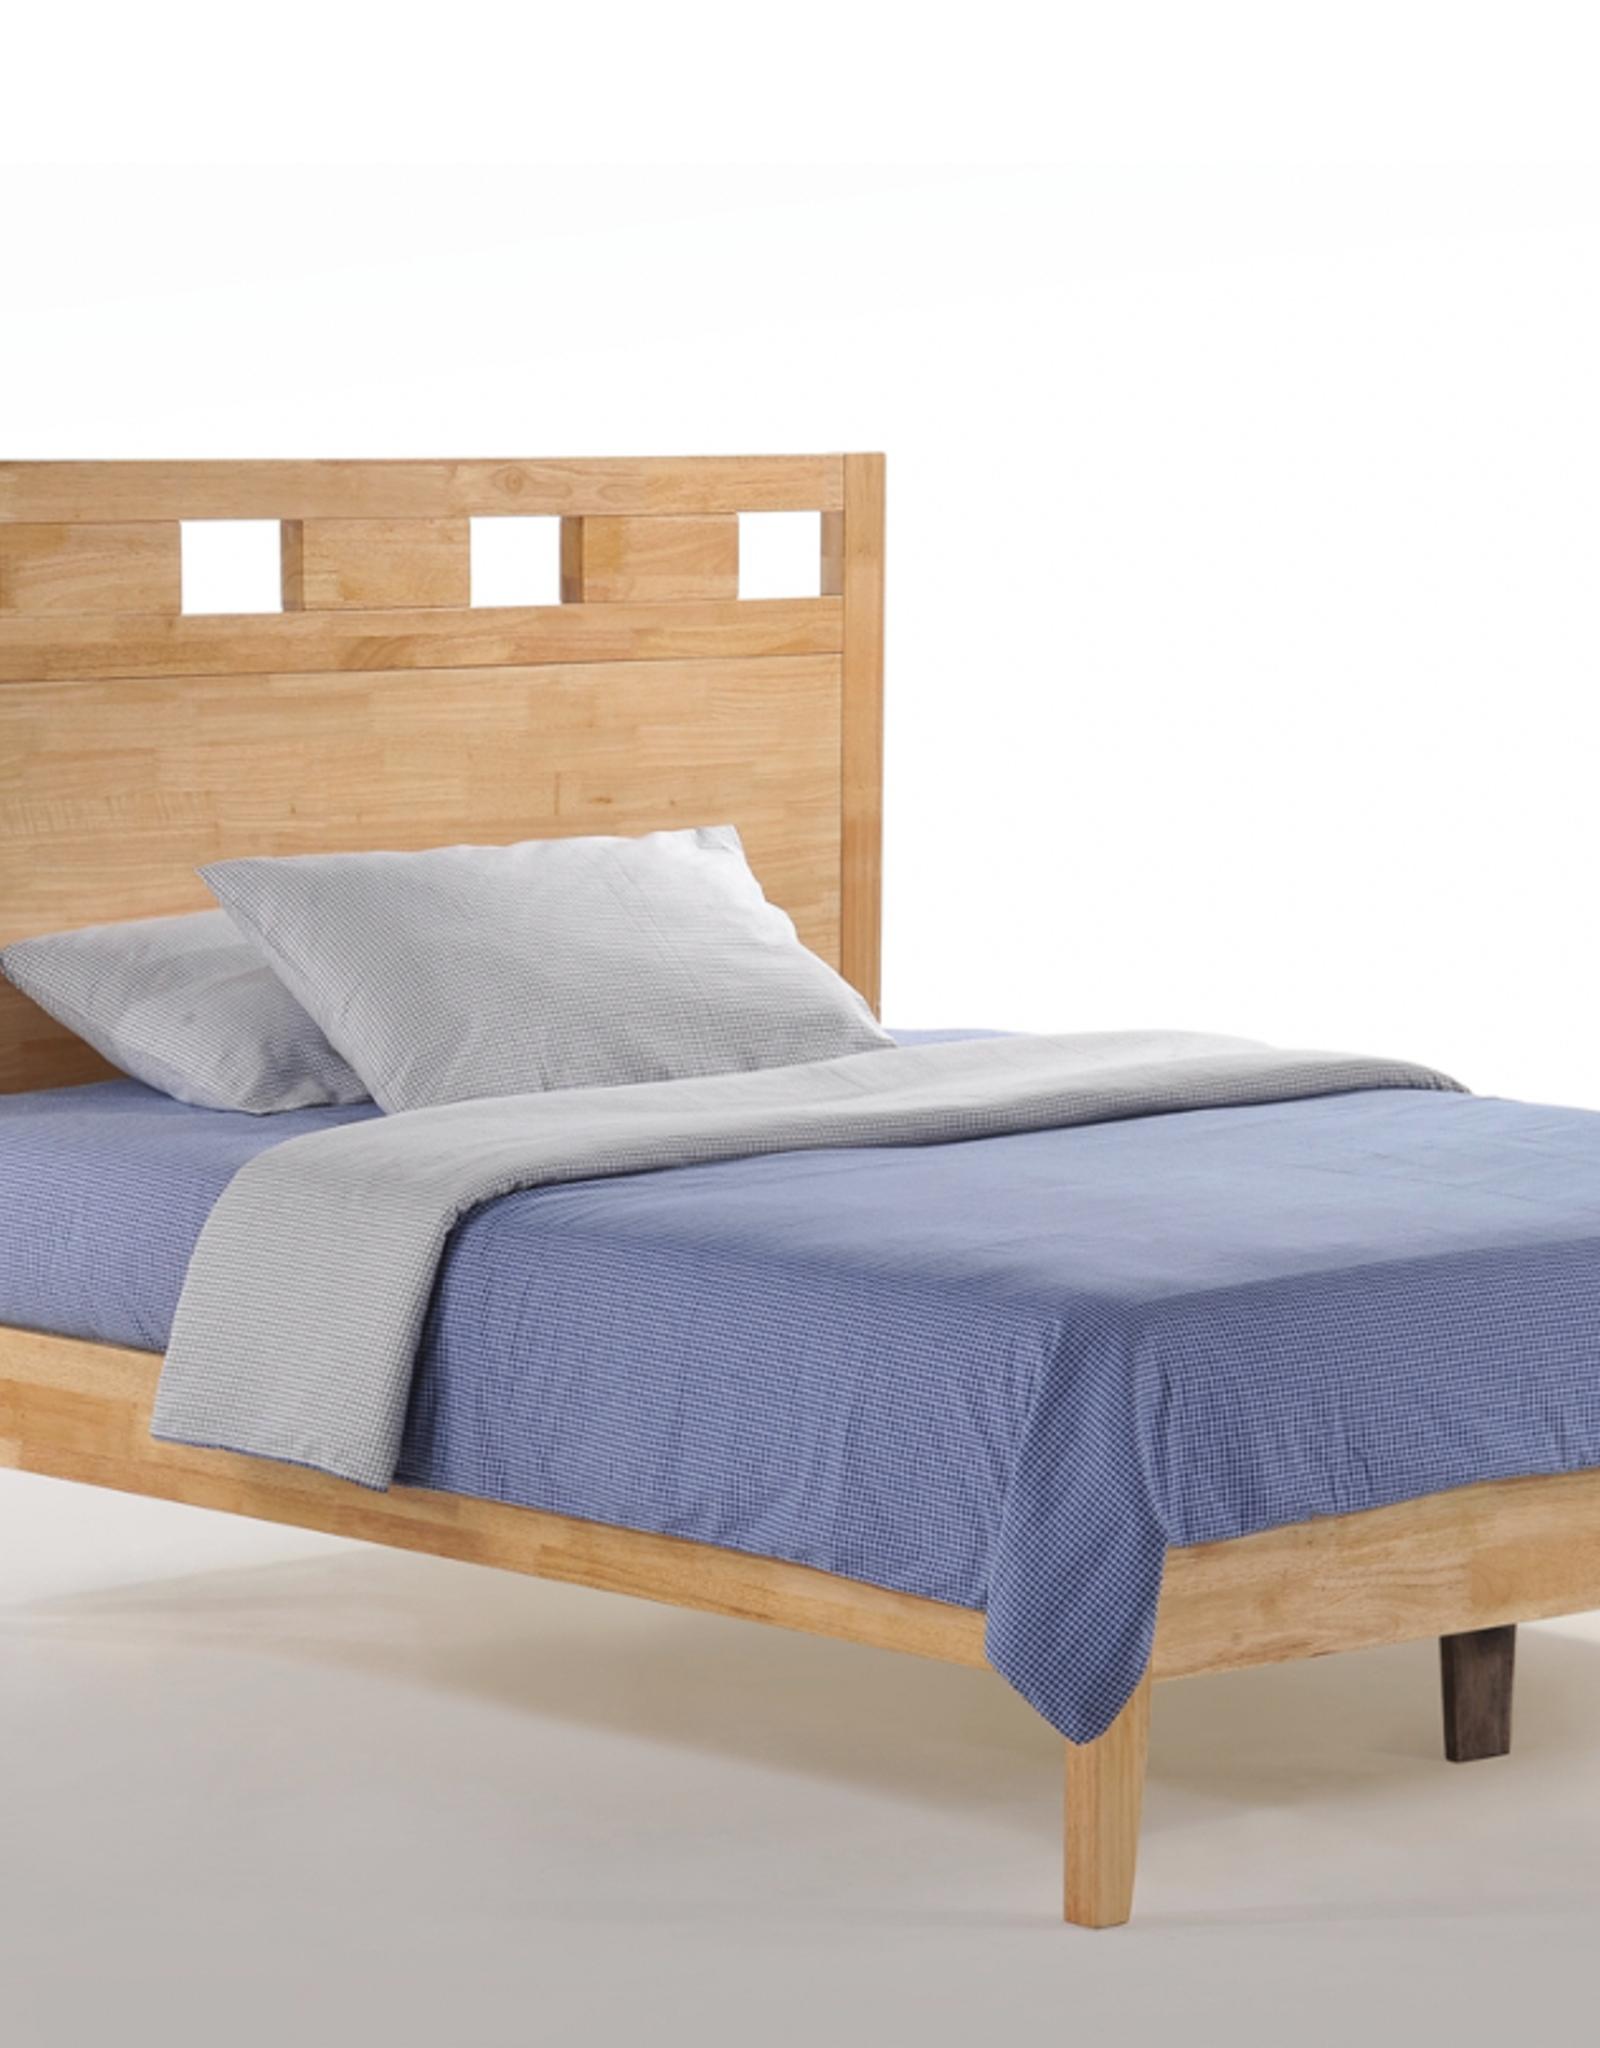 Tamarind Platform Bed - Comes in Five Colors